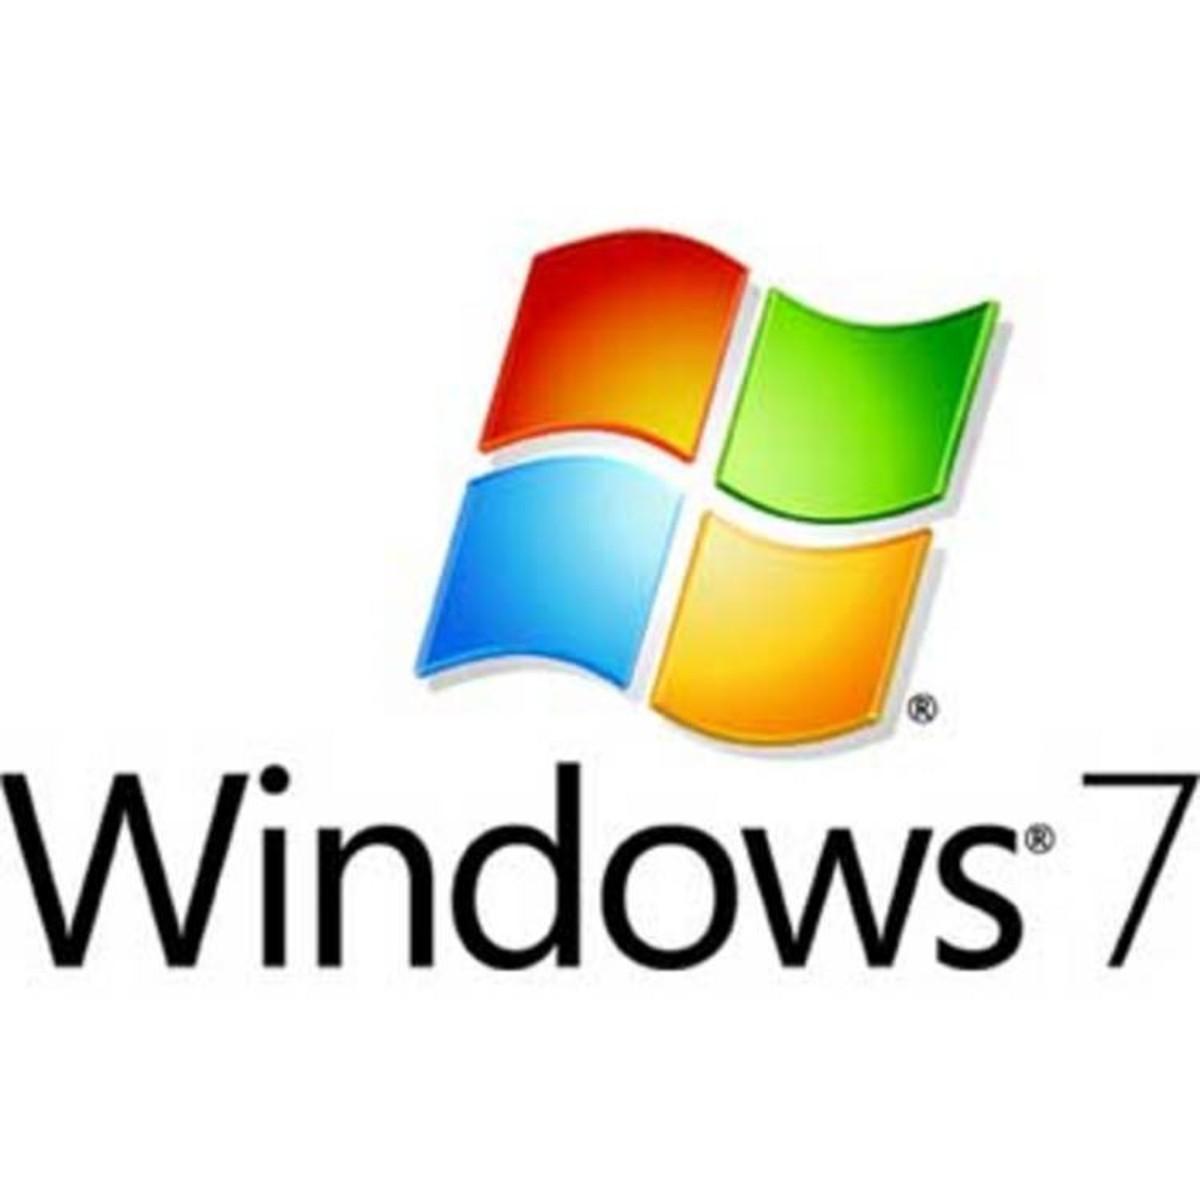 microsoft windows 7 64-bit home premium